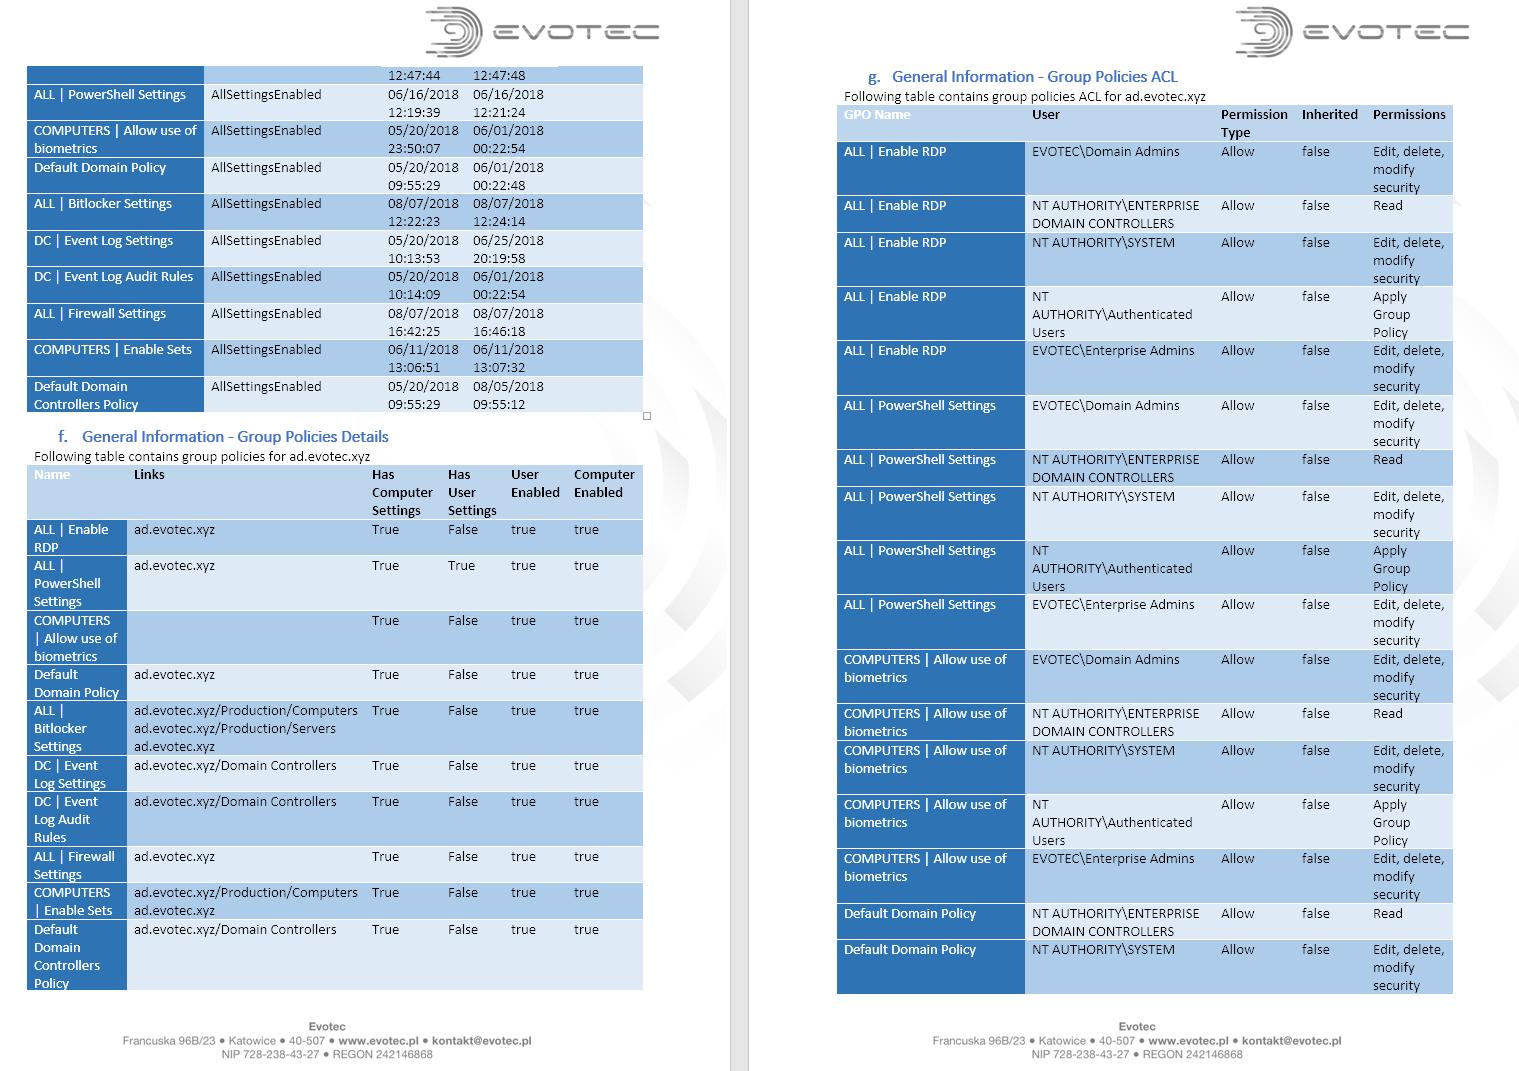 PSWinDocumentation - PowerShell Module - Evotec